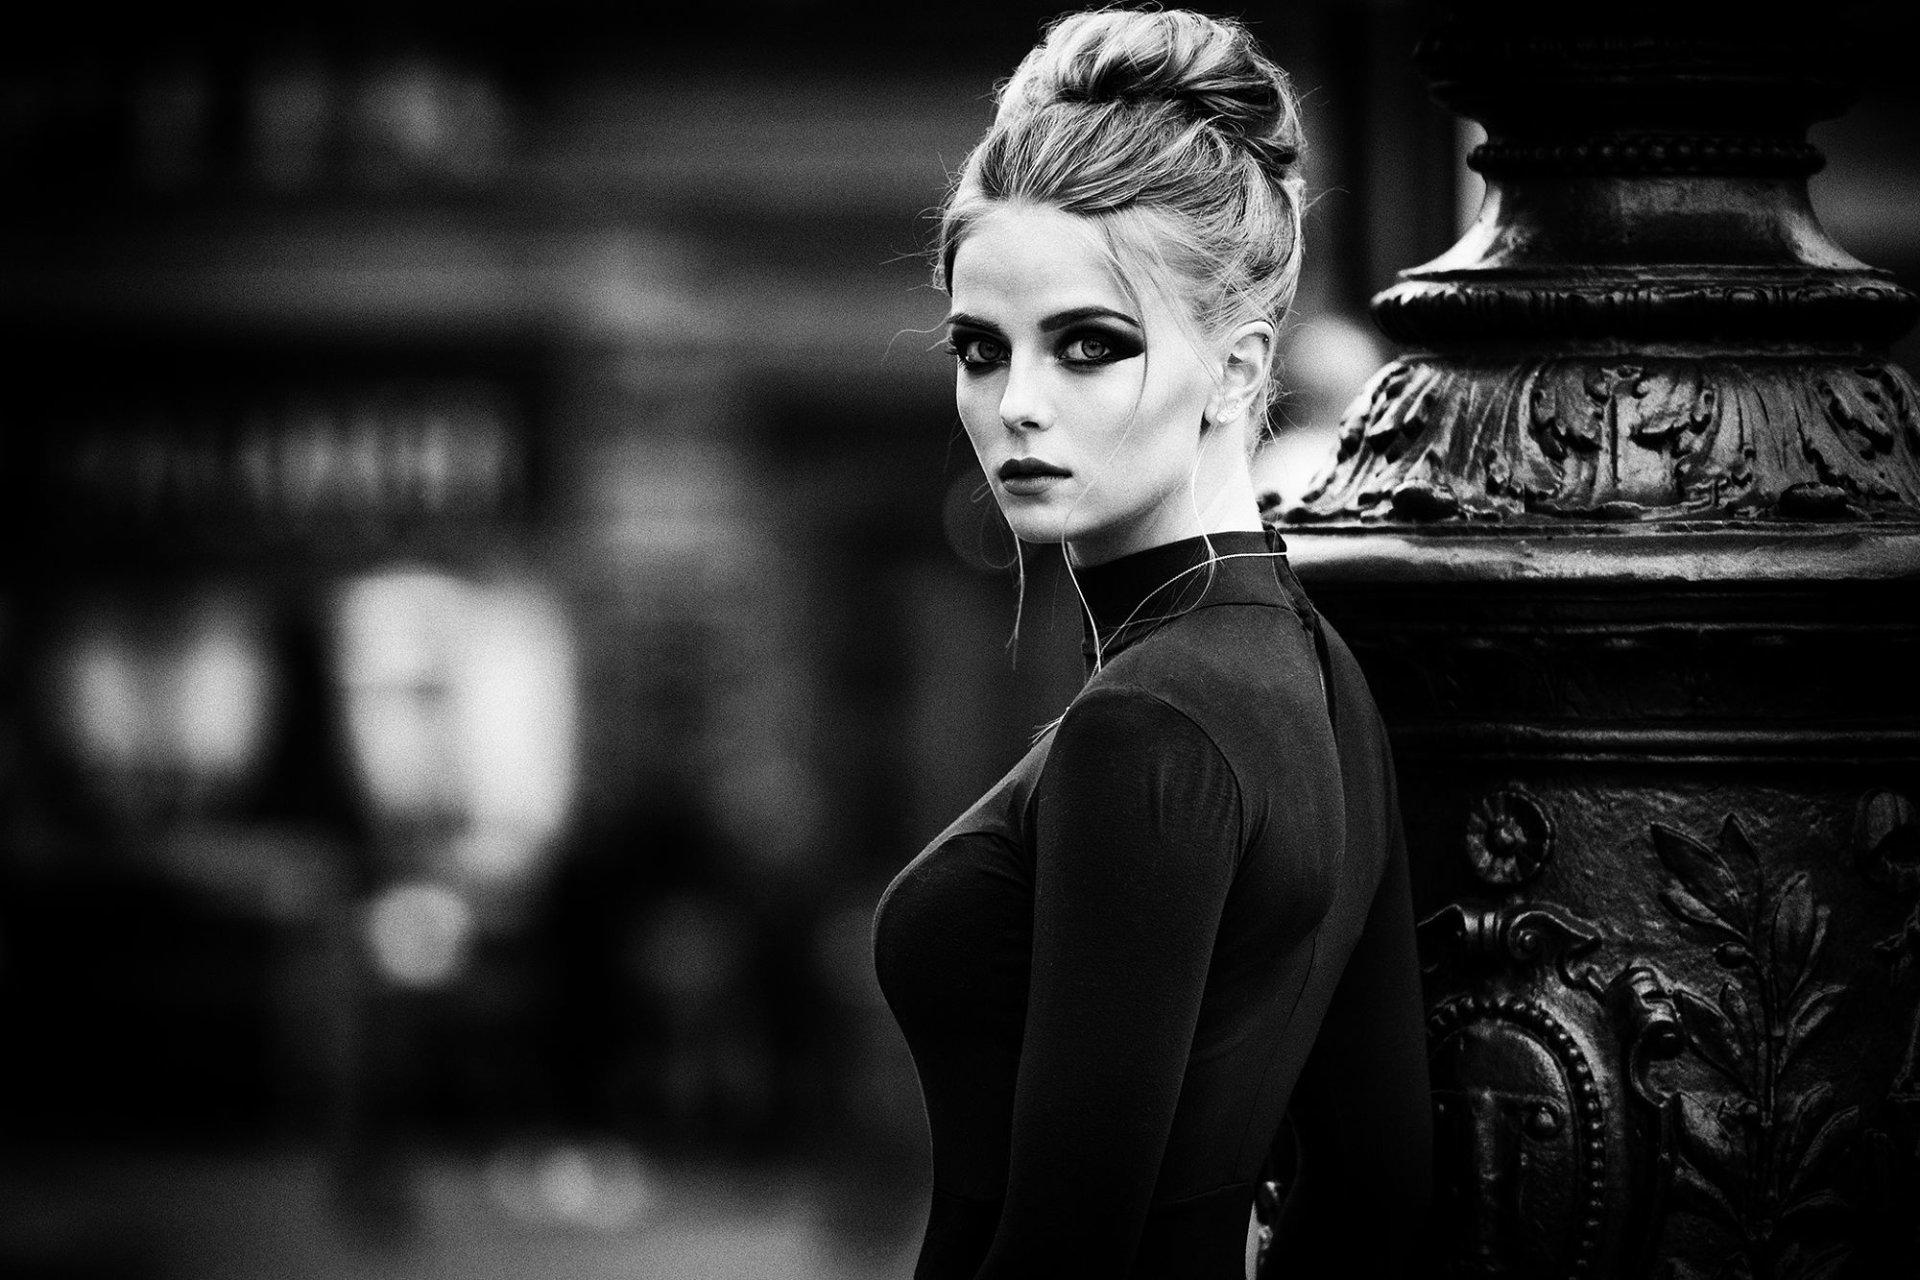 Women - Model  Woman Girl Black & White Wallpaper